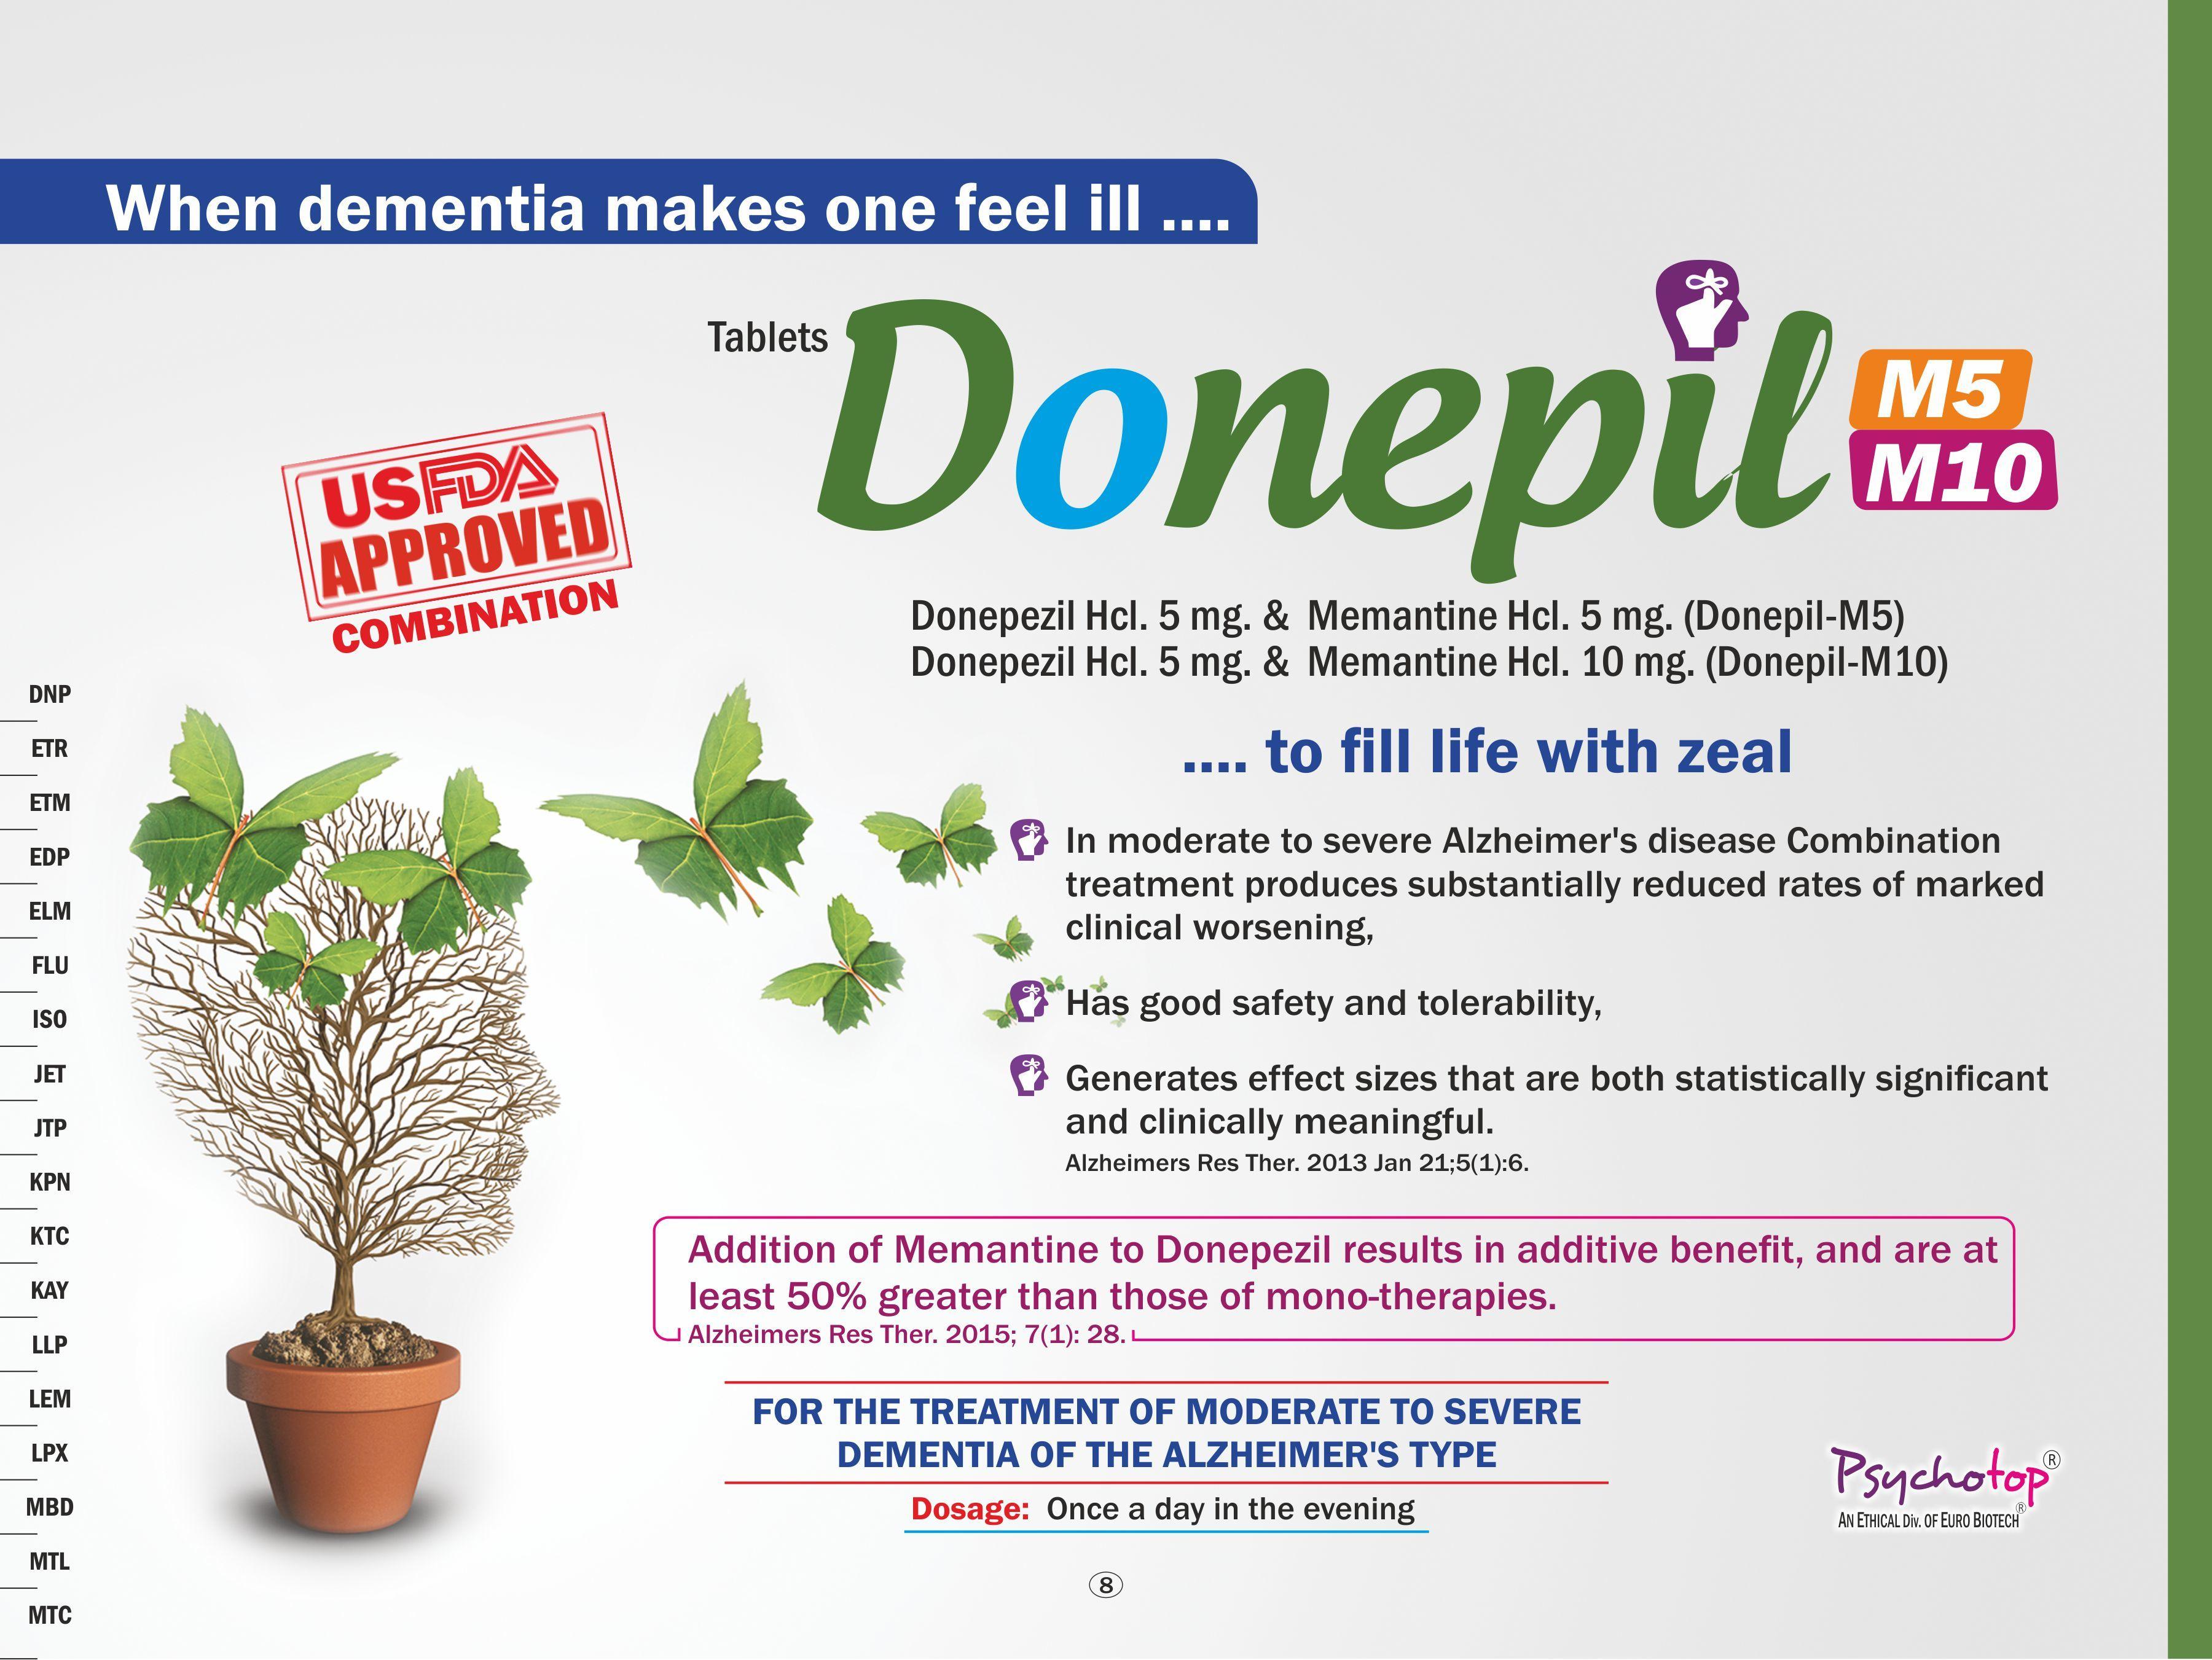 Donepzil Hcl 5 mg & Memantine 5 mg /10 mg